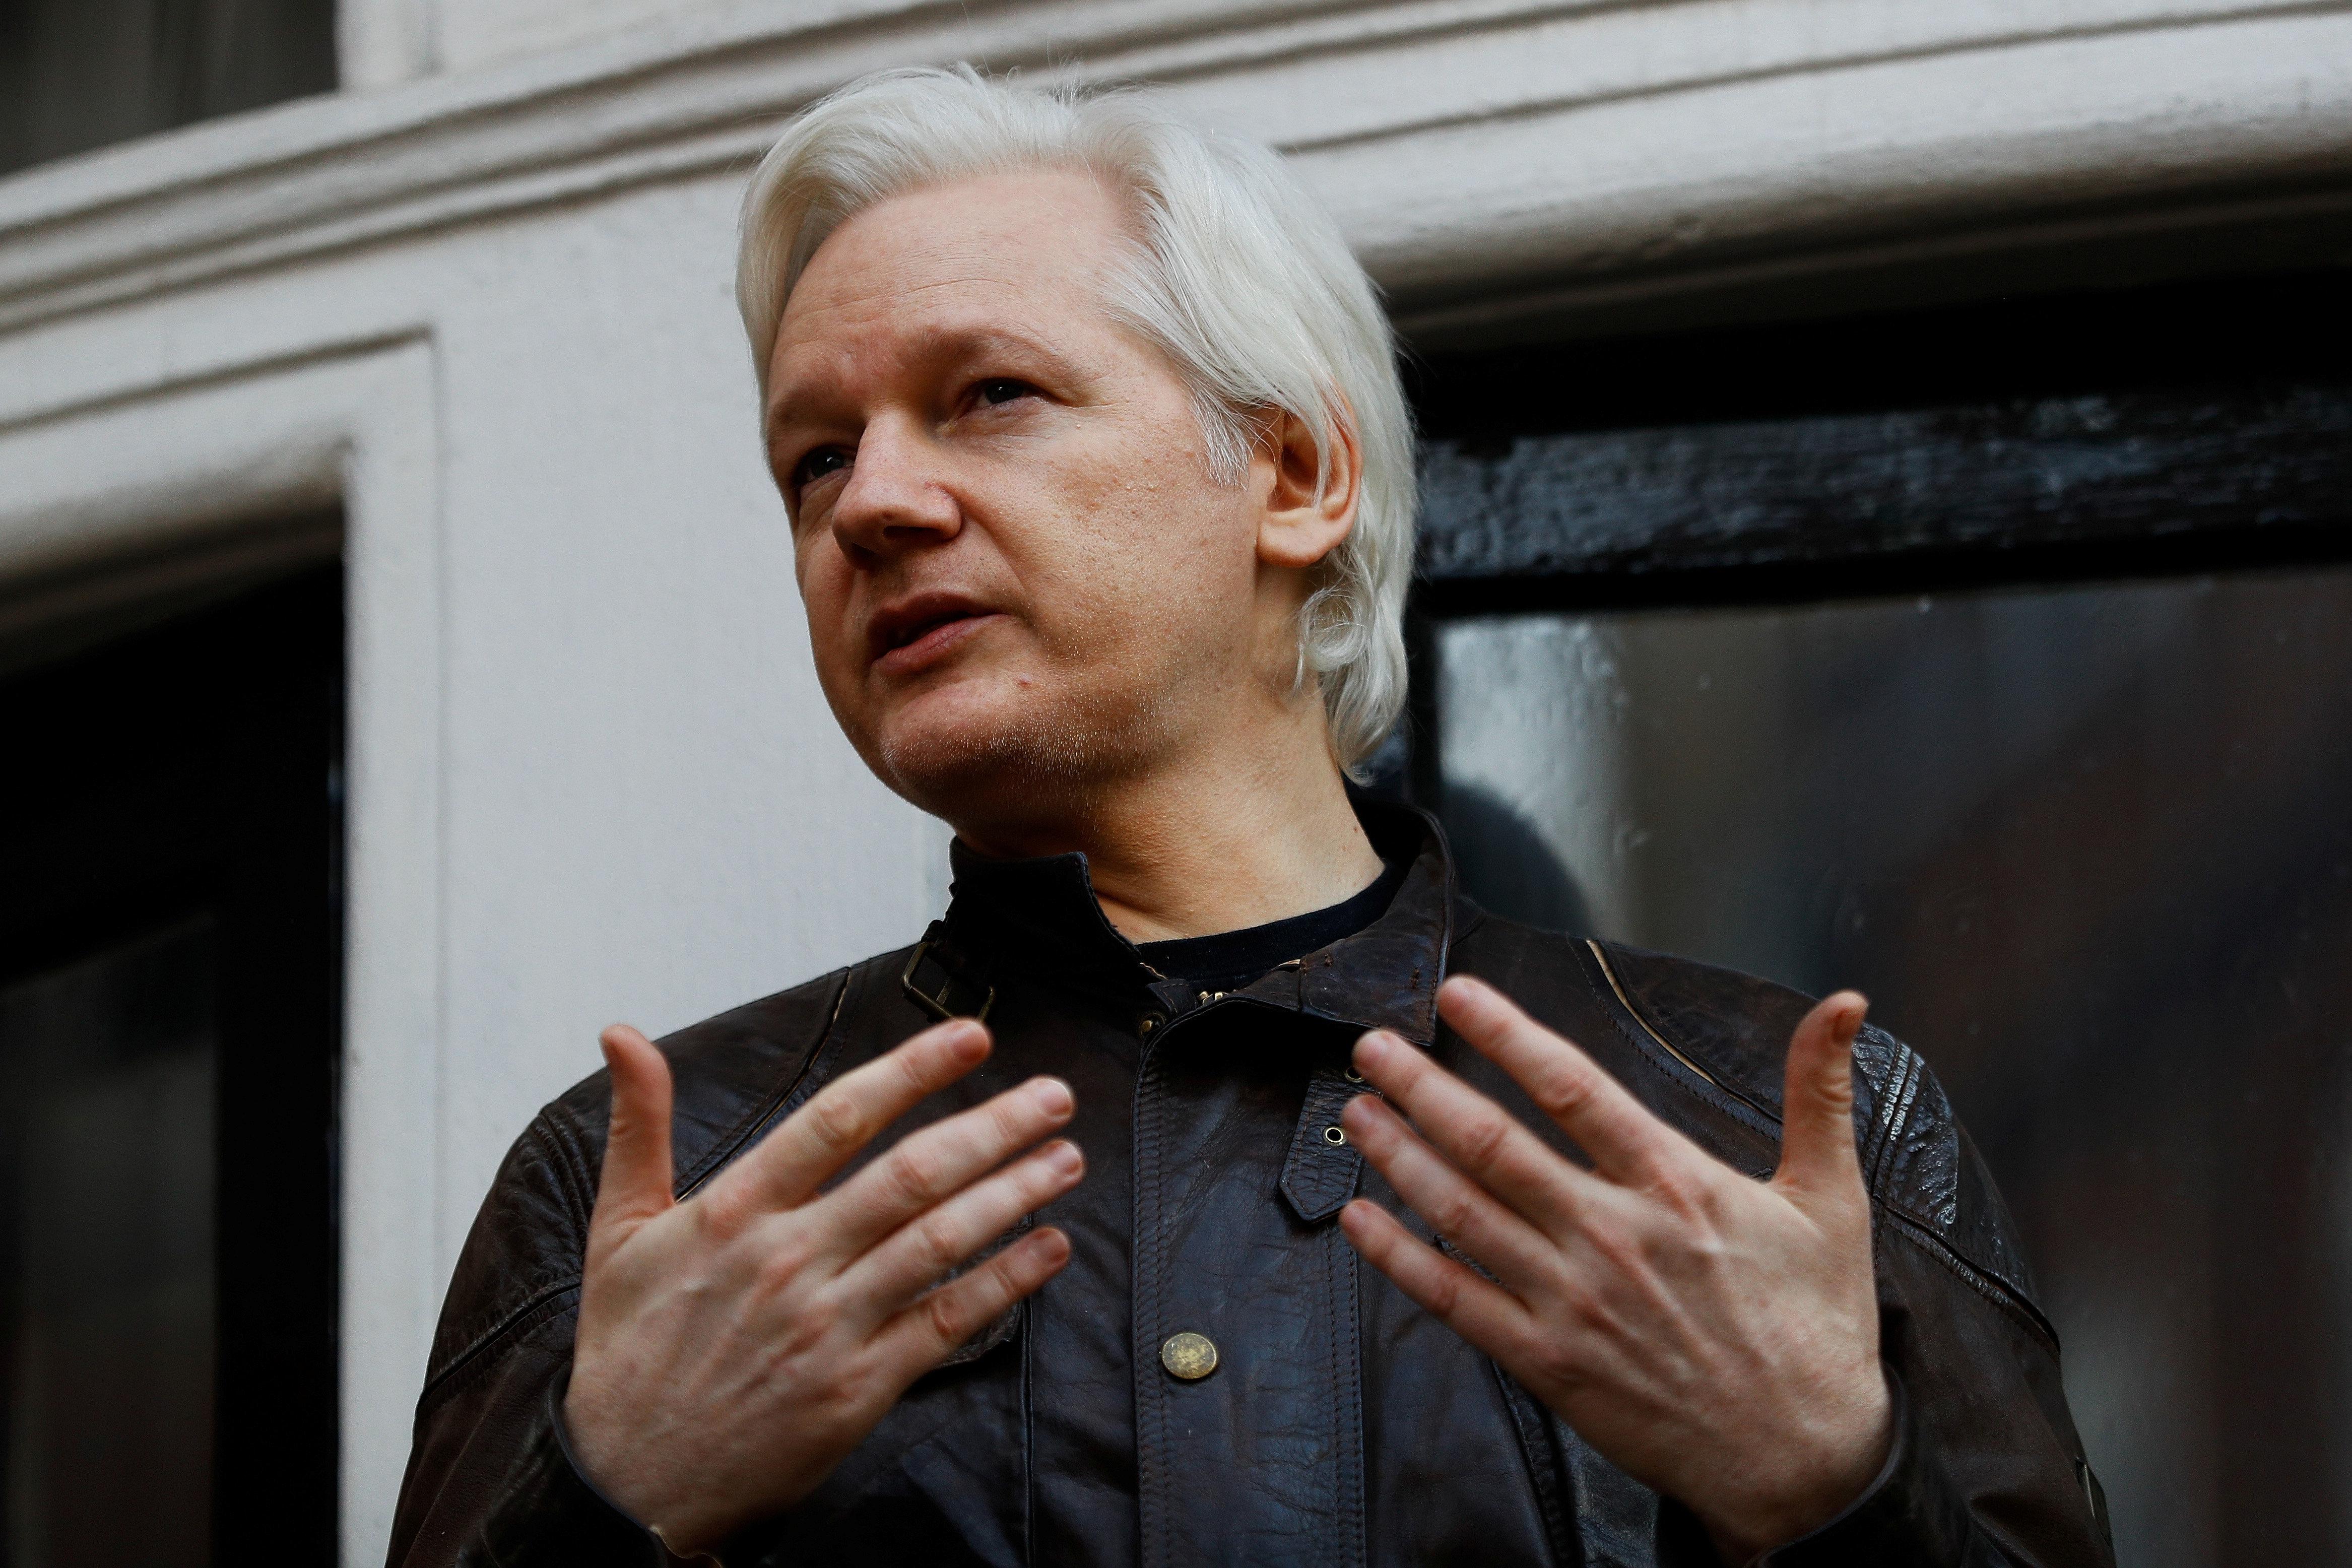 Julian Assange 'Seriously Considering' Testifying Before Senate